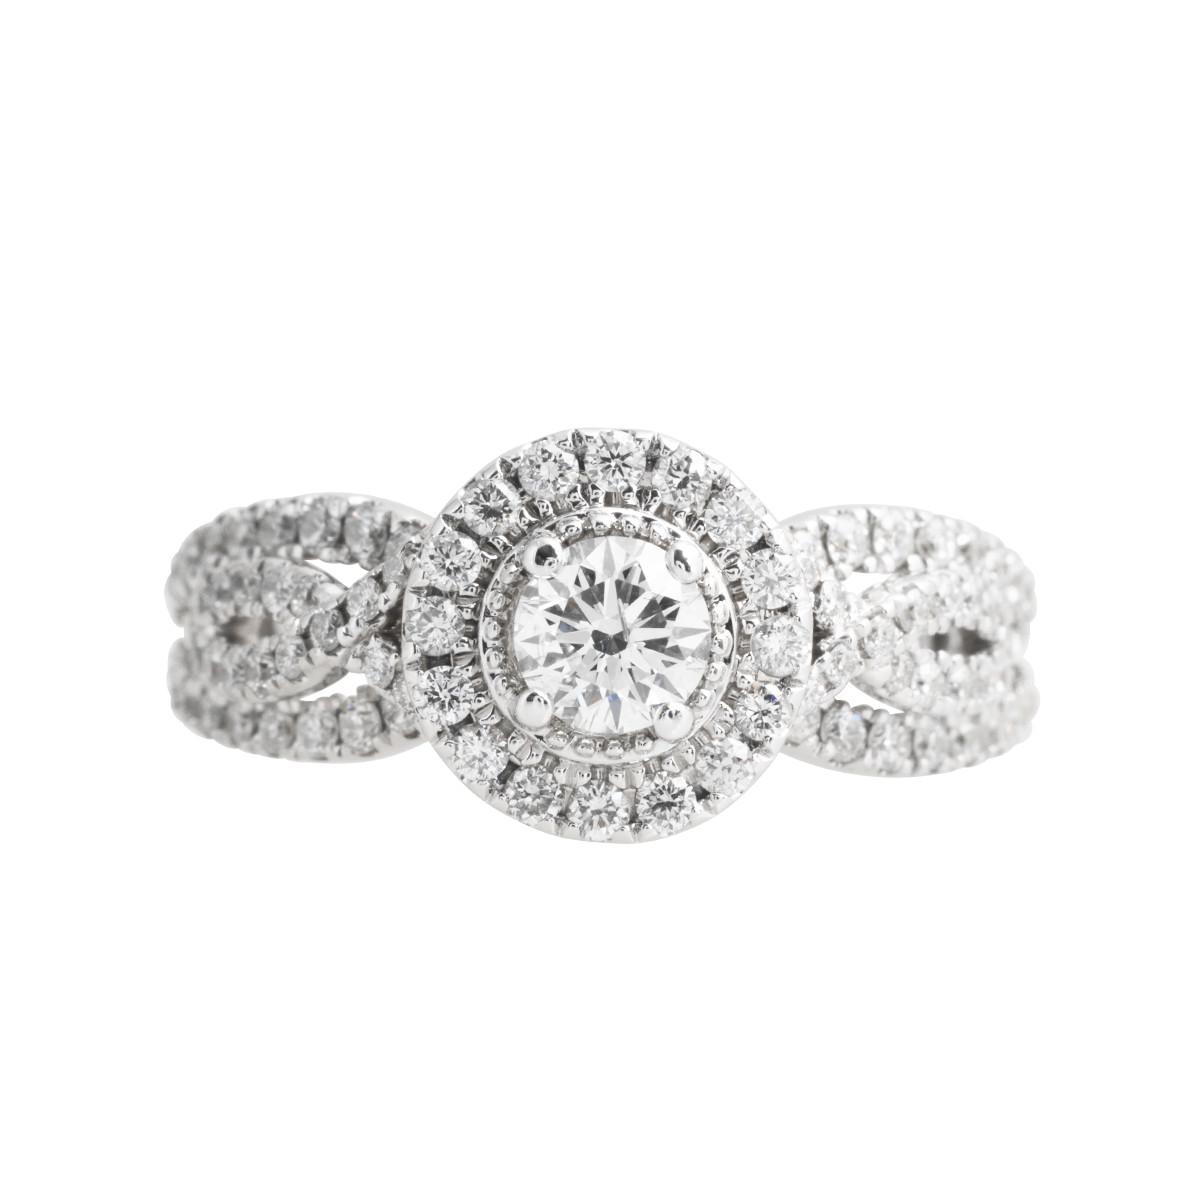 Vintage Vera Wang 1.06 CTW Diamond Halo Engagement Ring